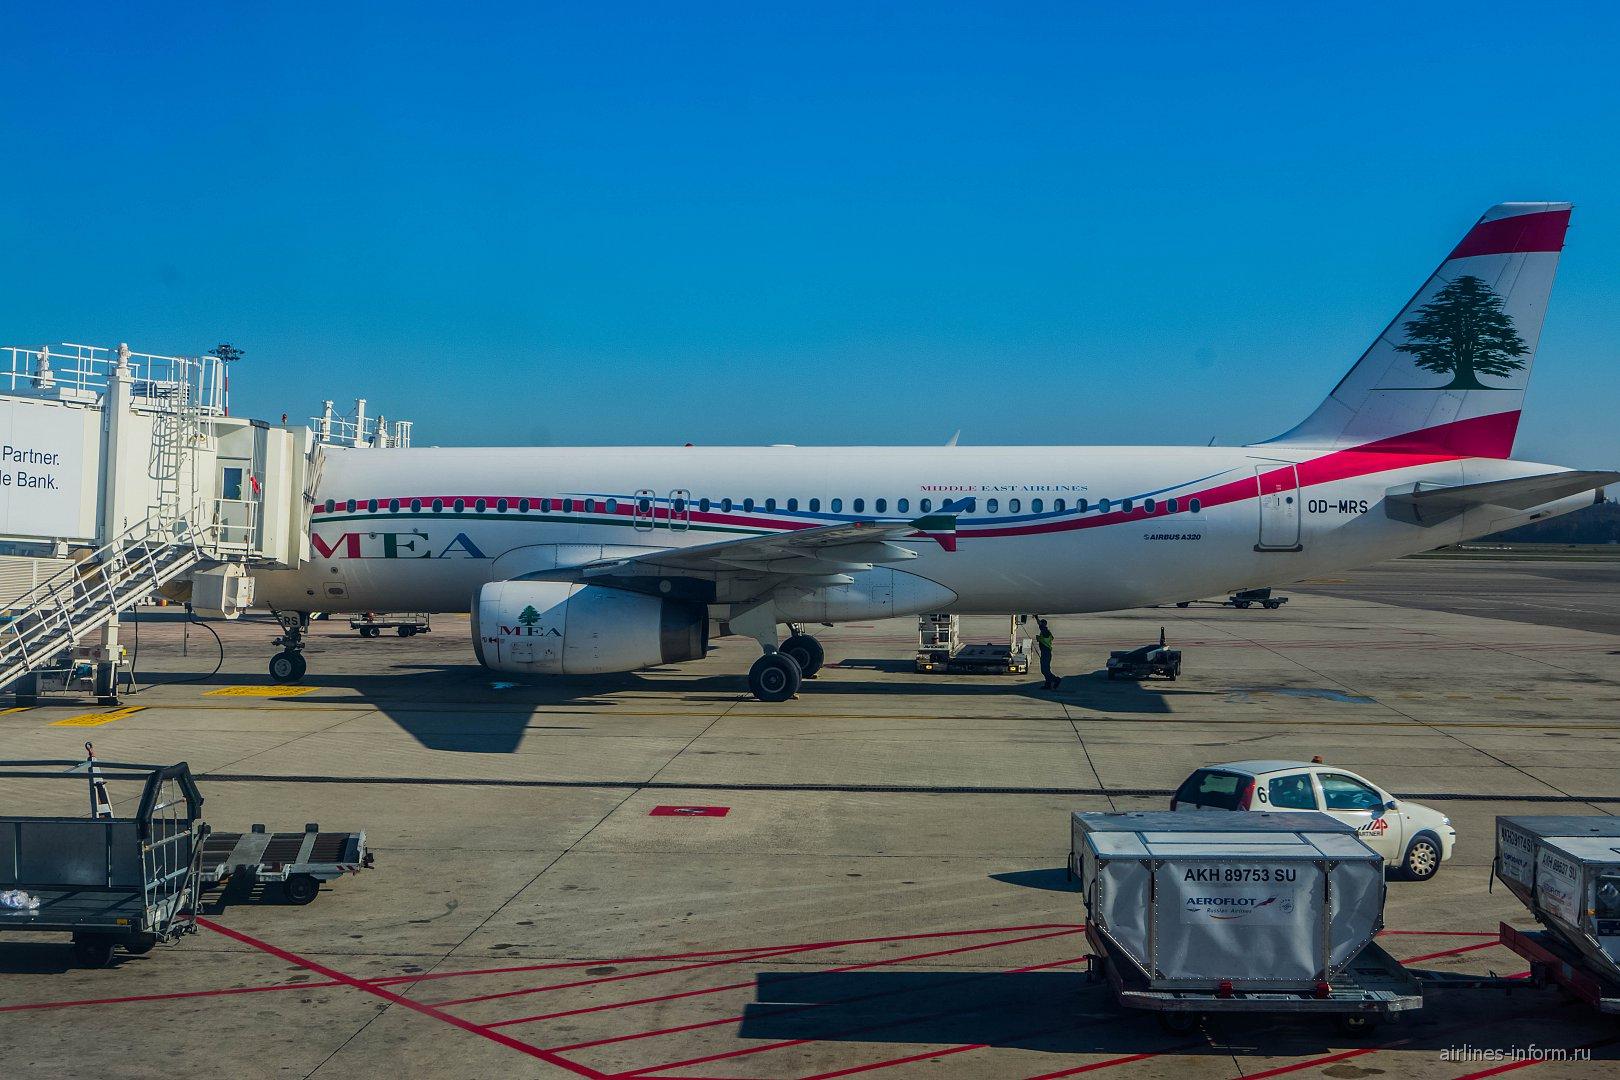 Airbus A320 авиакомпании MEA в аэропорту Милана